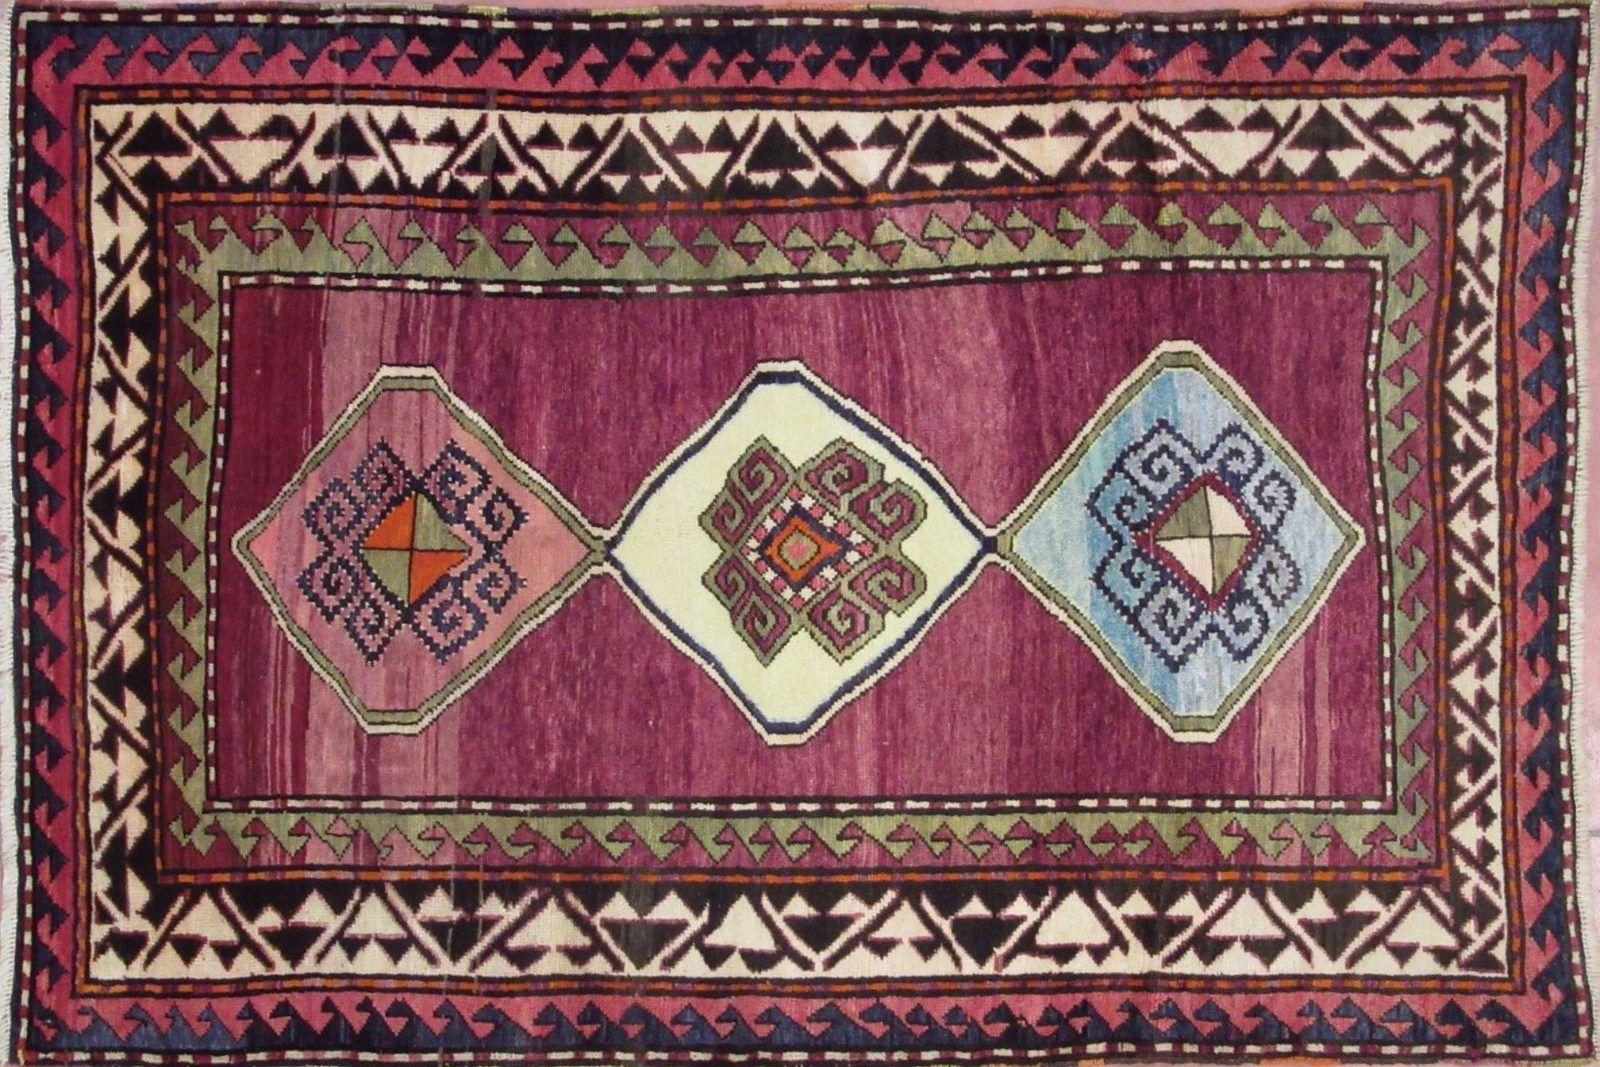 N. 294841 KAZAK ANTICO 200 x 136 cm. Tappeti